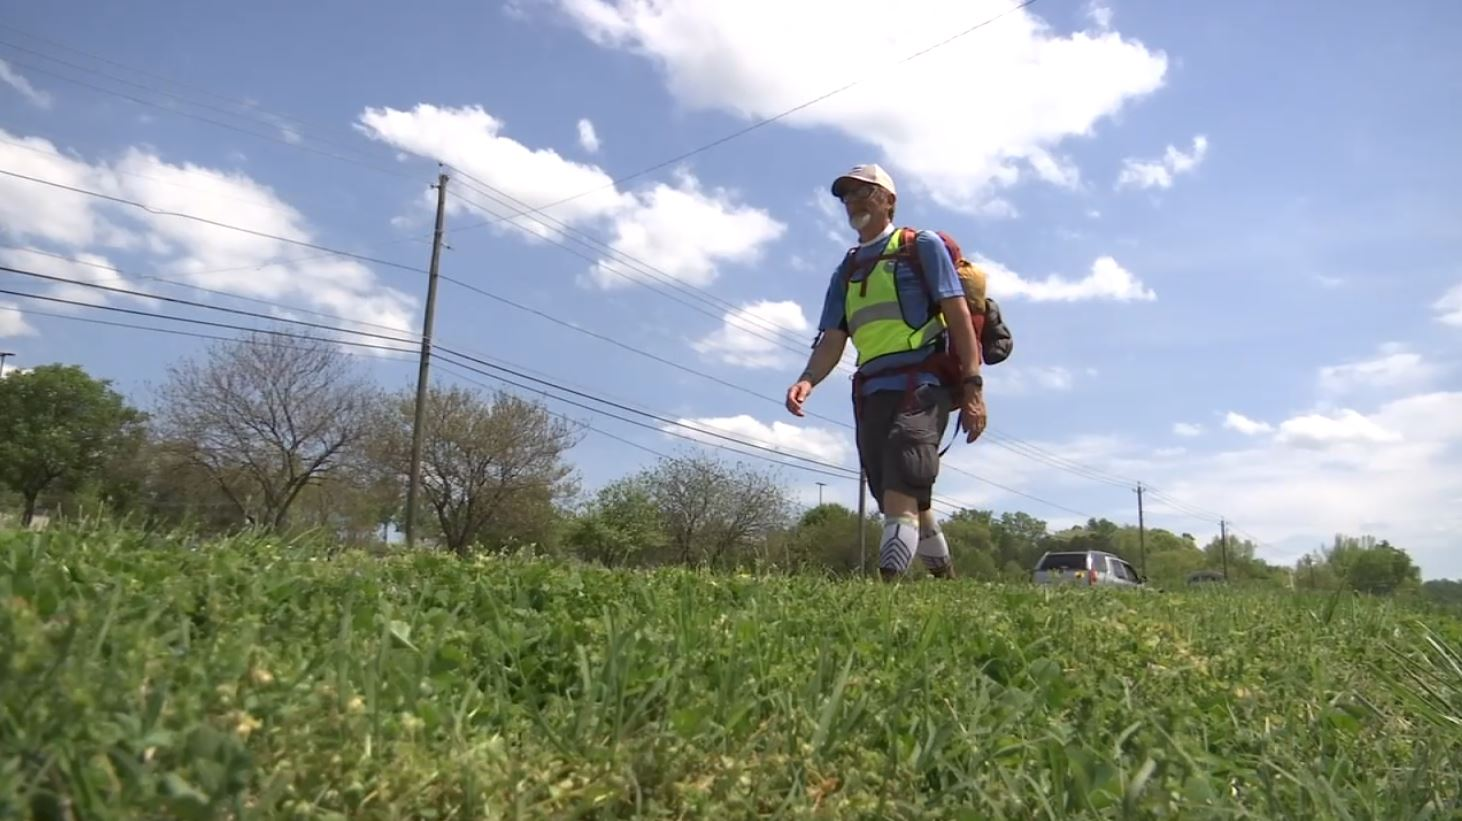 COVER PHOTO_Episcopal Priest walking across U.S. for kids_1555623014353.JPG-727168854.jpg